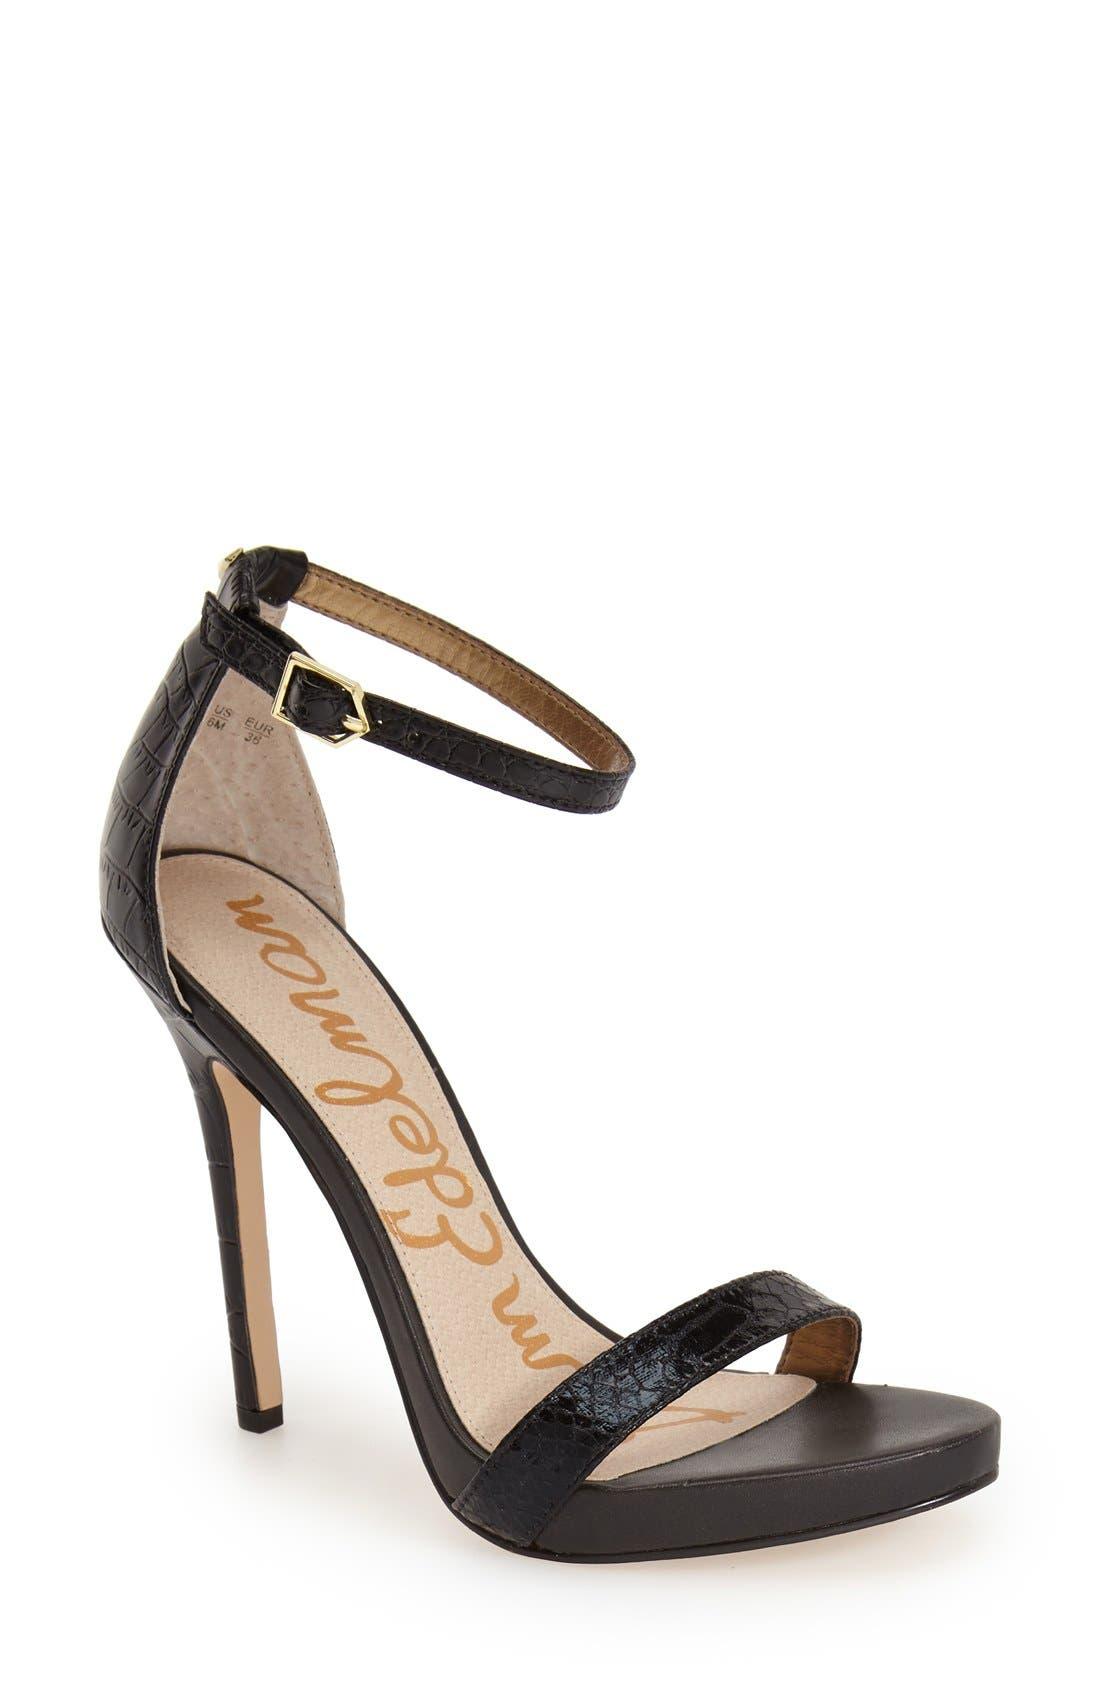 Main Image - Sam Edelman 'Eleanor' Ankle Strap Sandal (Women)